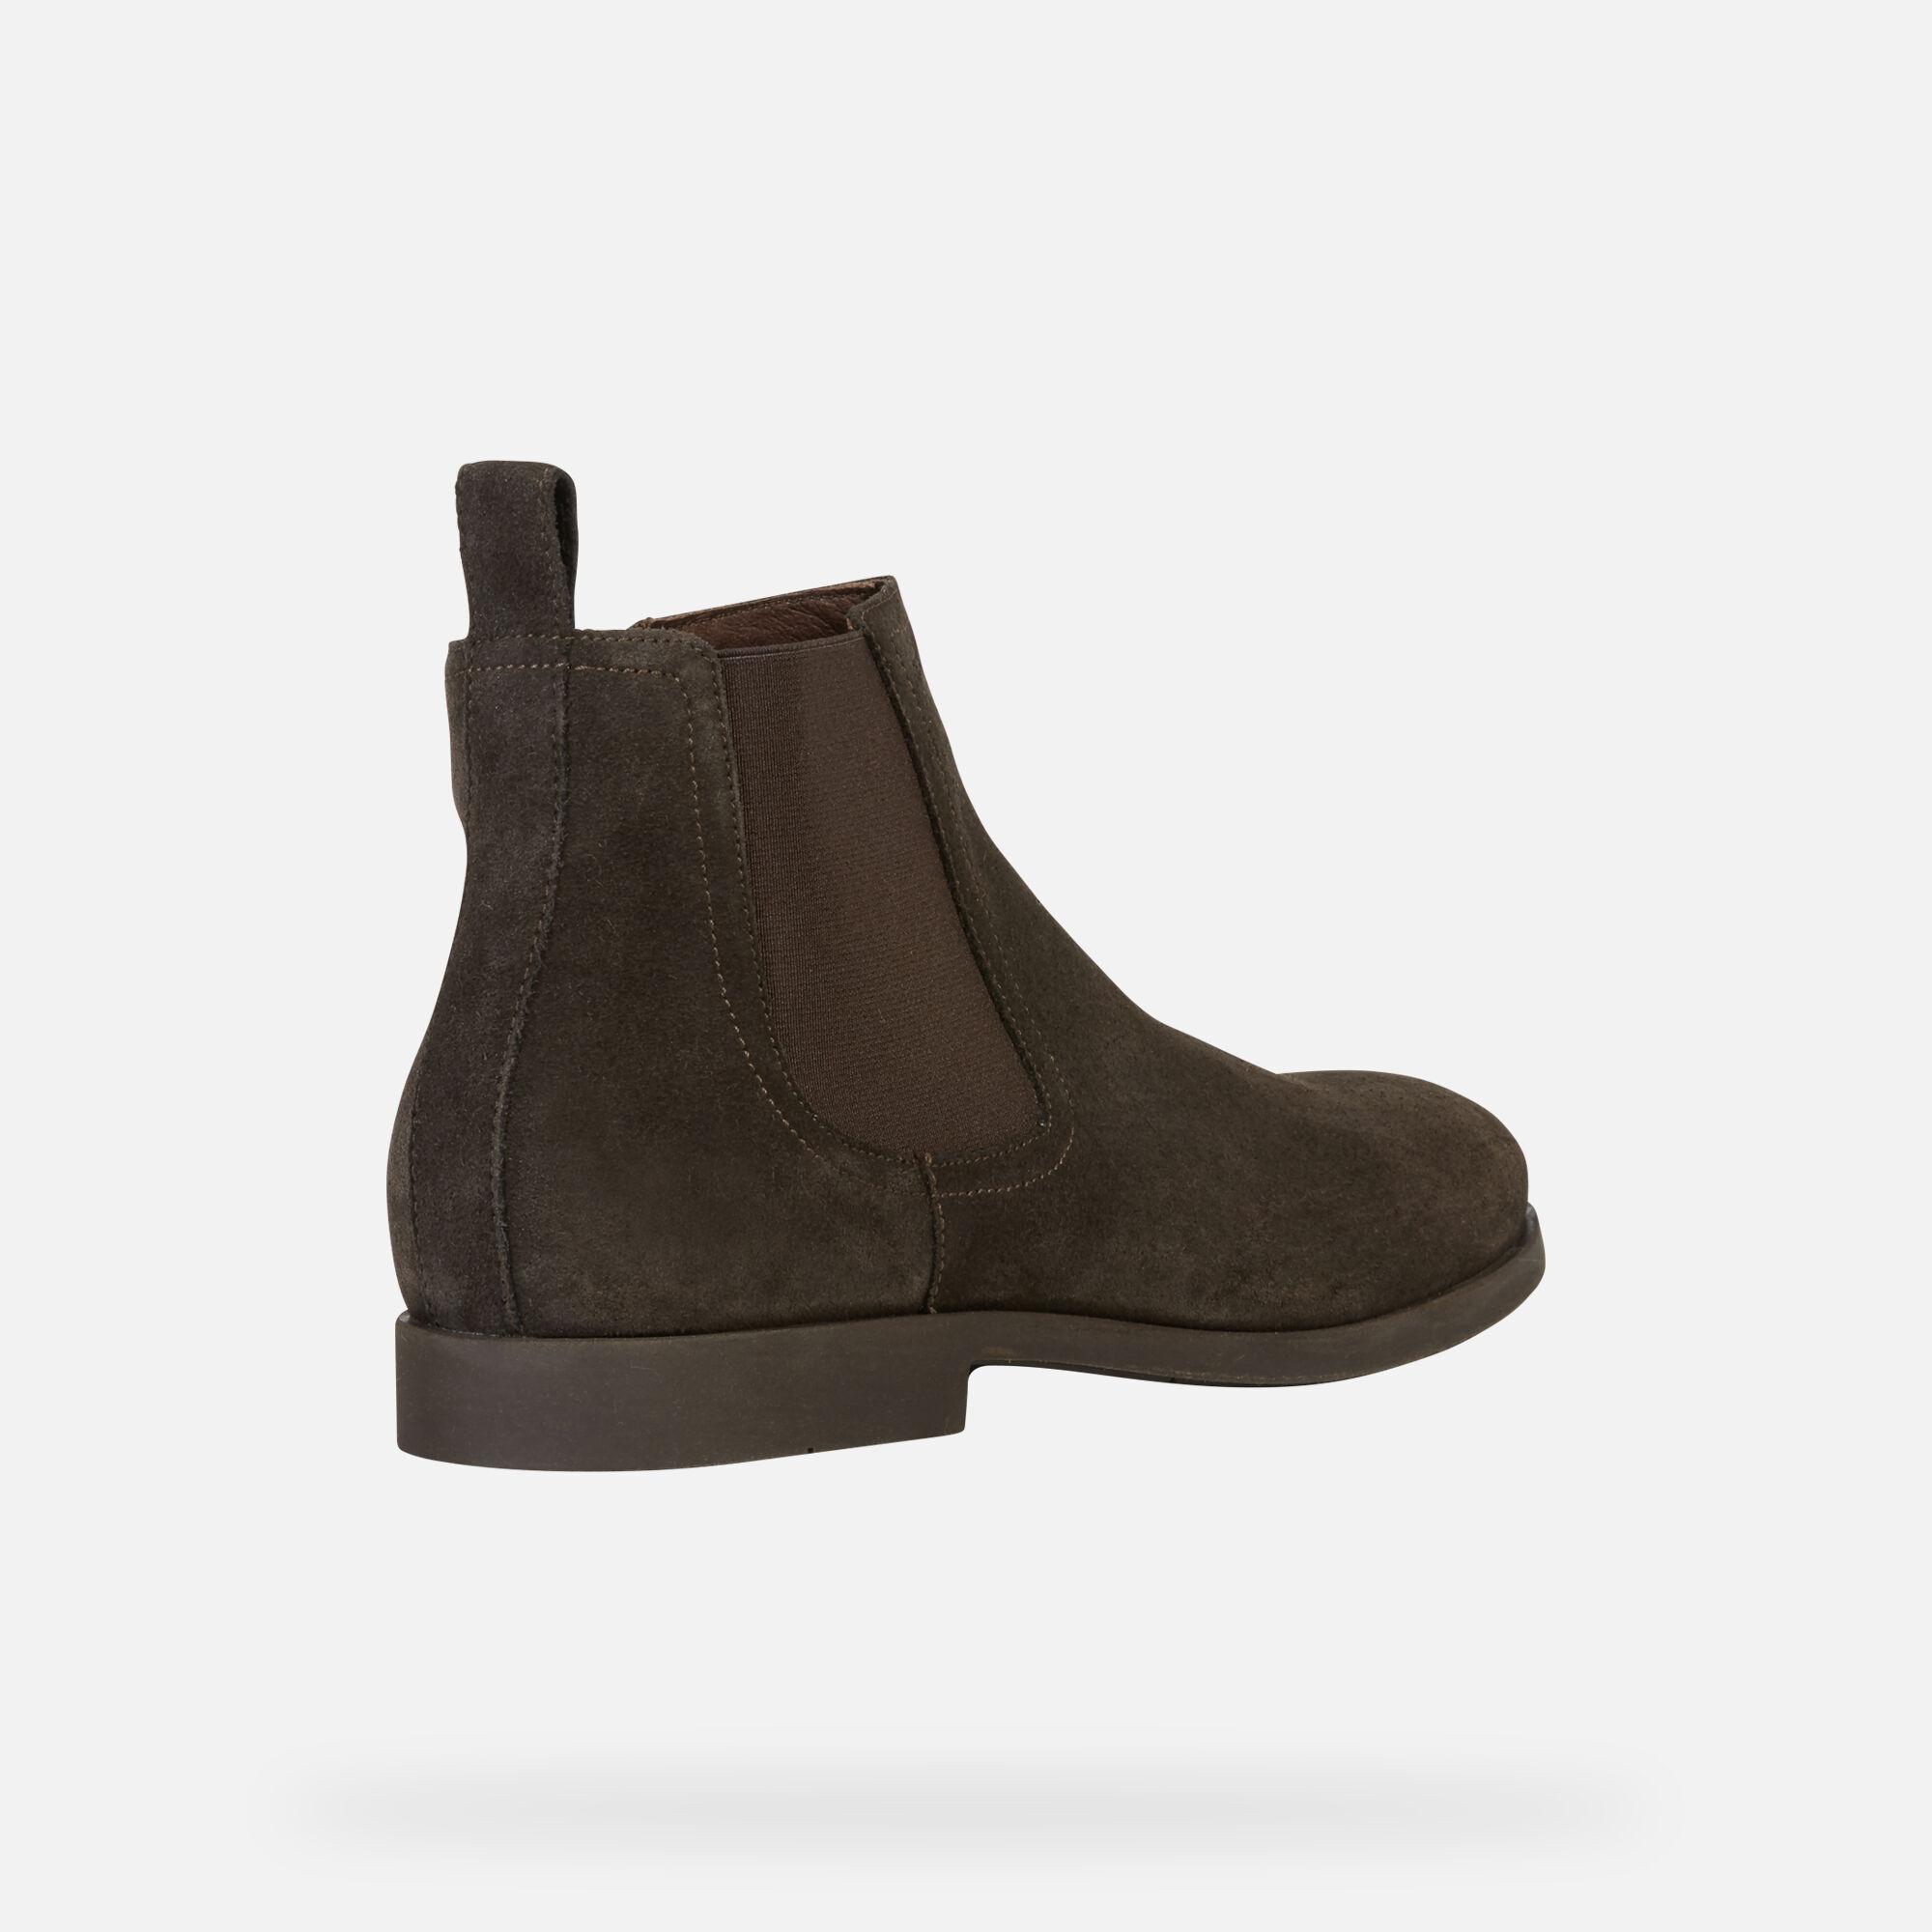 Geox KASPAR Man: Dark coffee Ankle Boots | Geox Fall Winter